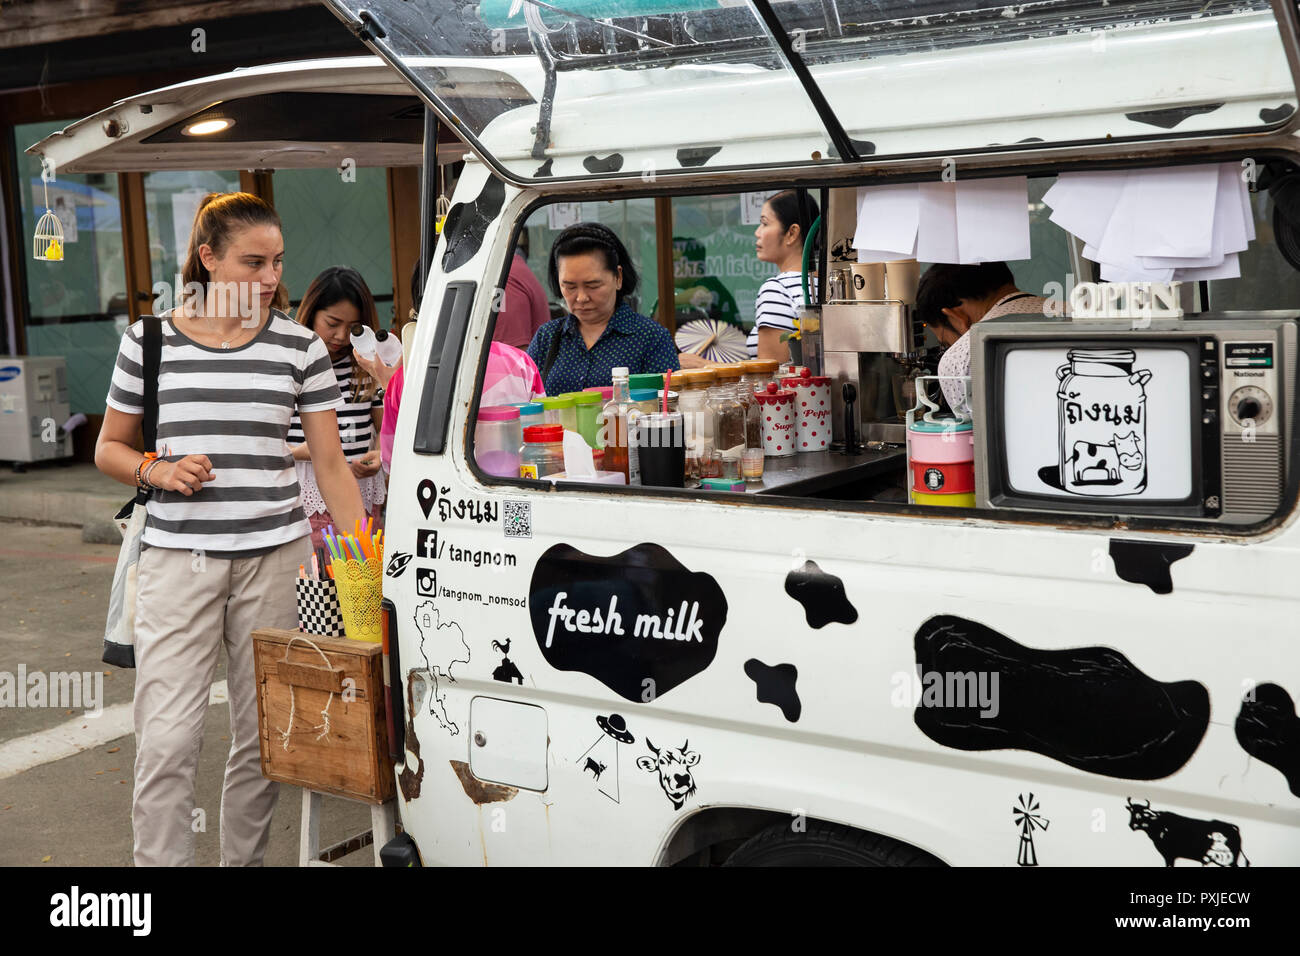 Tourist buys coffee at mobile coffee shop at JingJai Farmer's Market, Chiang Mai, Thailand - Stock Image